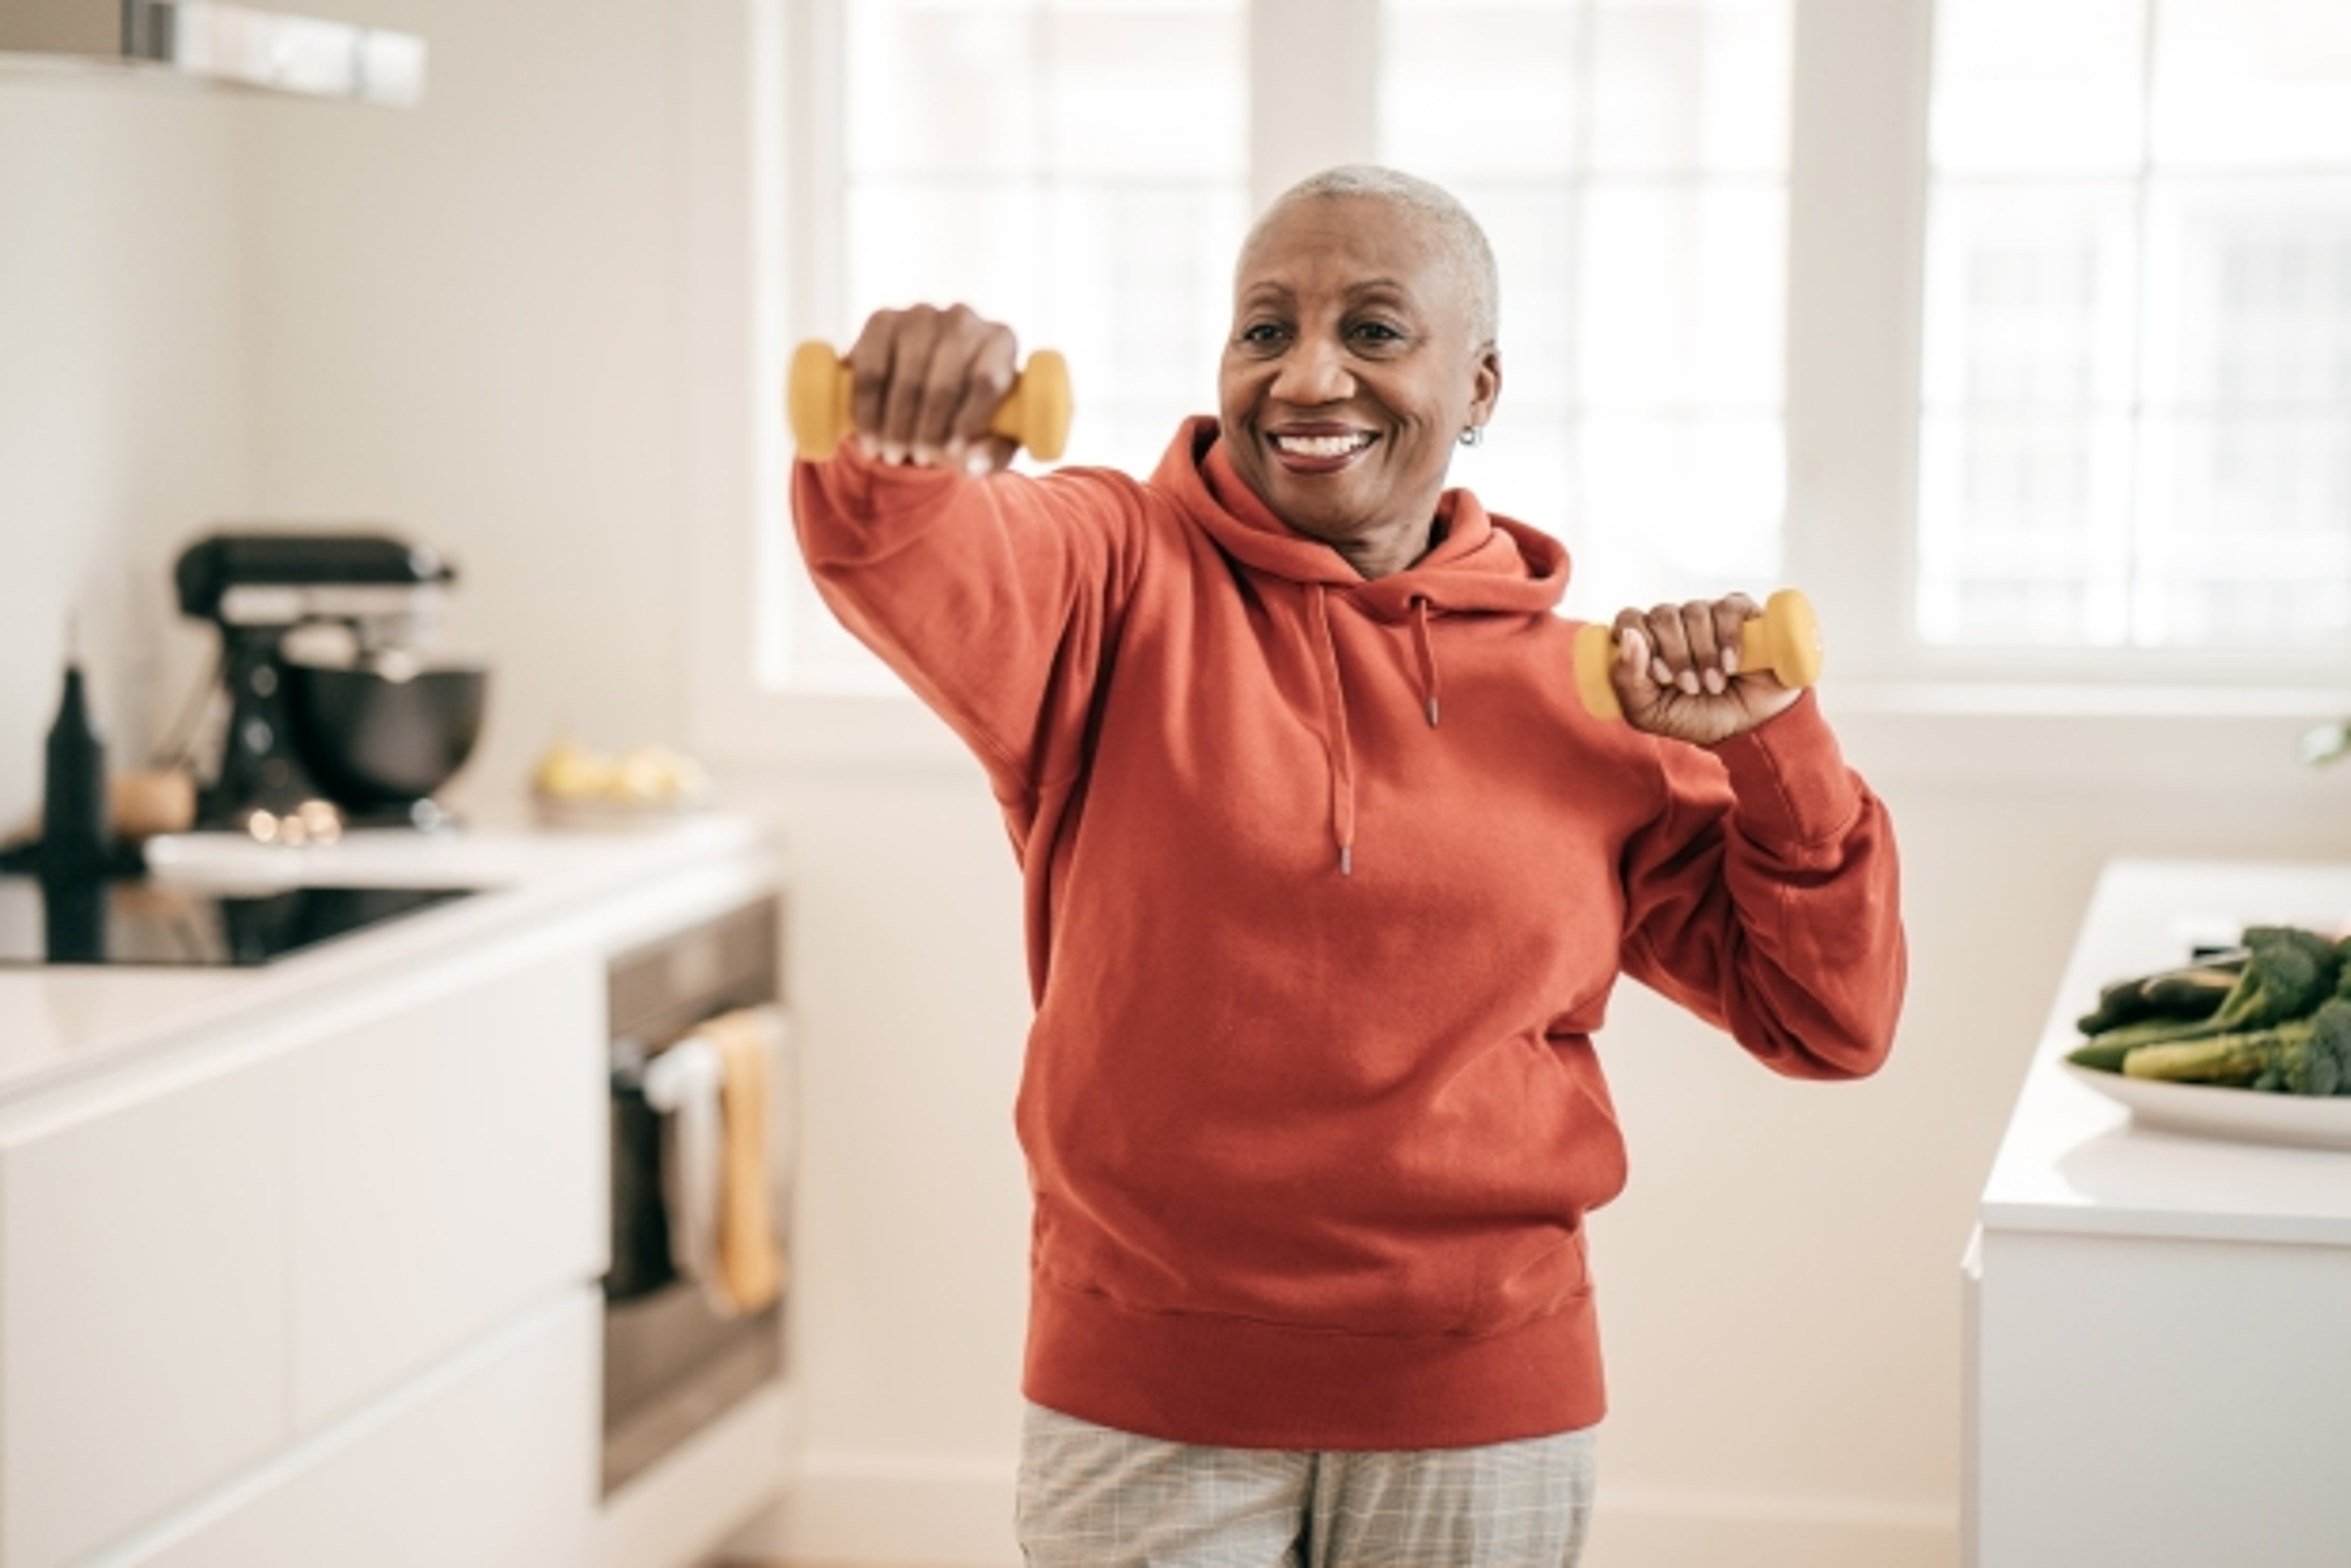 Senior women exercising at home